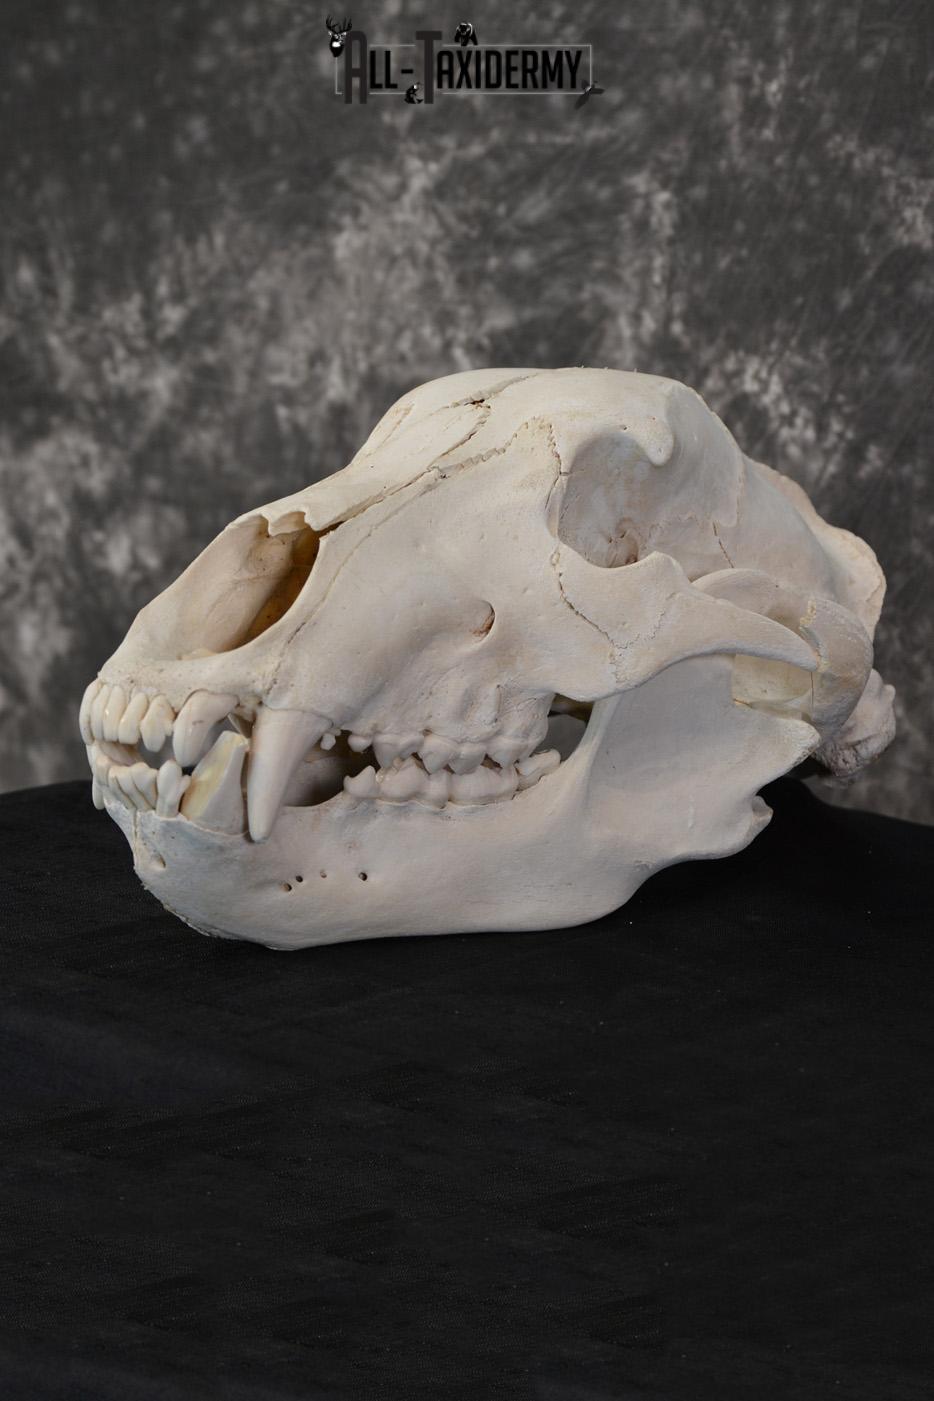 Russian Brown Bear Skull Taxidermy Mount for sale SKU 1533